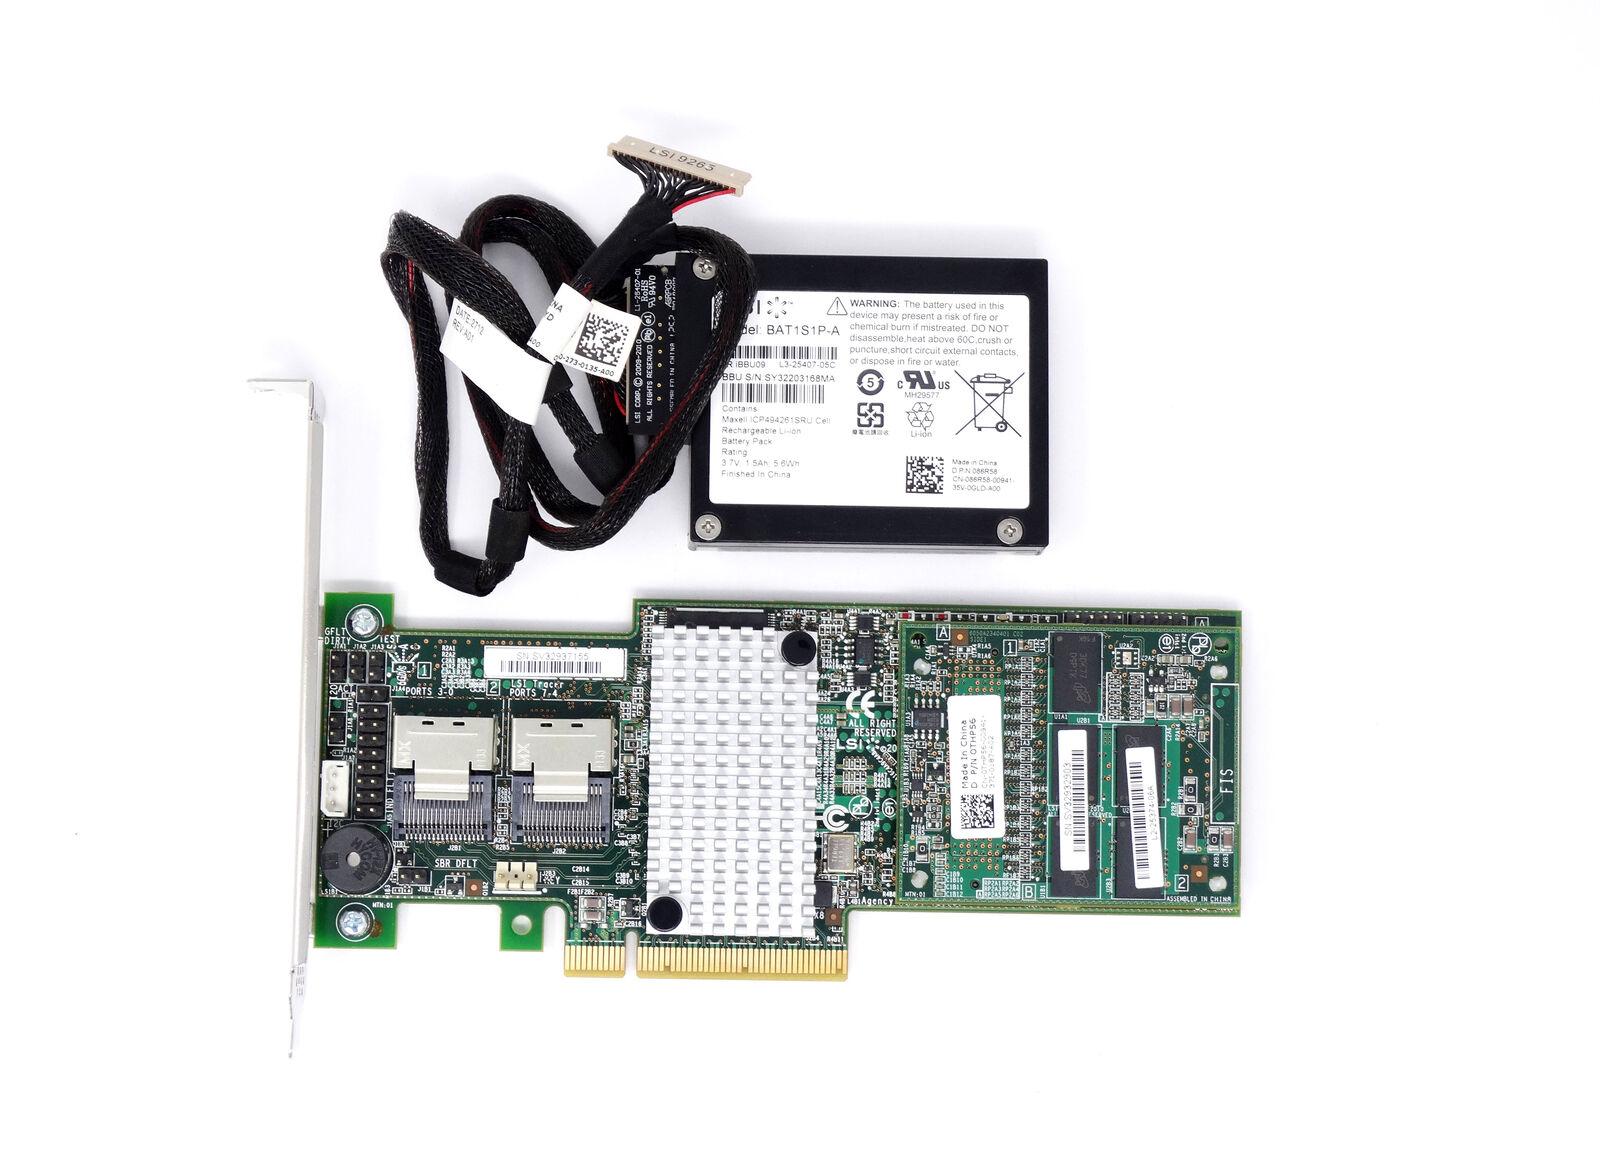 Dell LSI 9265-8I 6Gb/s 1GB 8-Port PCIe SAS SATA Raid Controller Card (PRMX8)